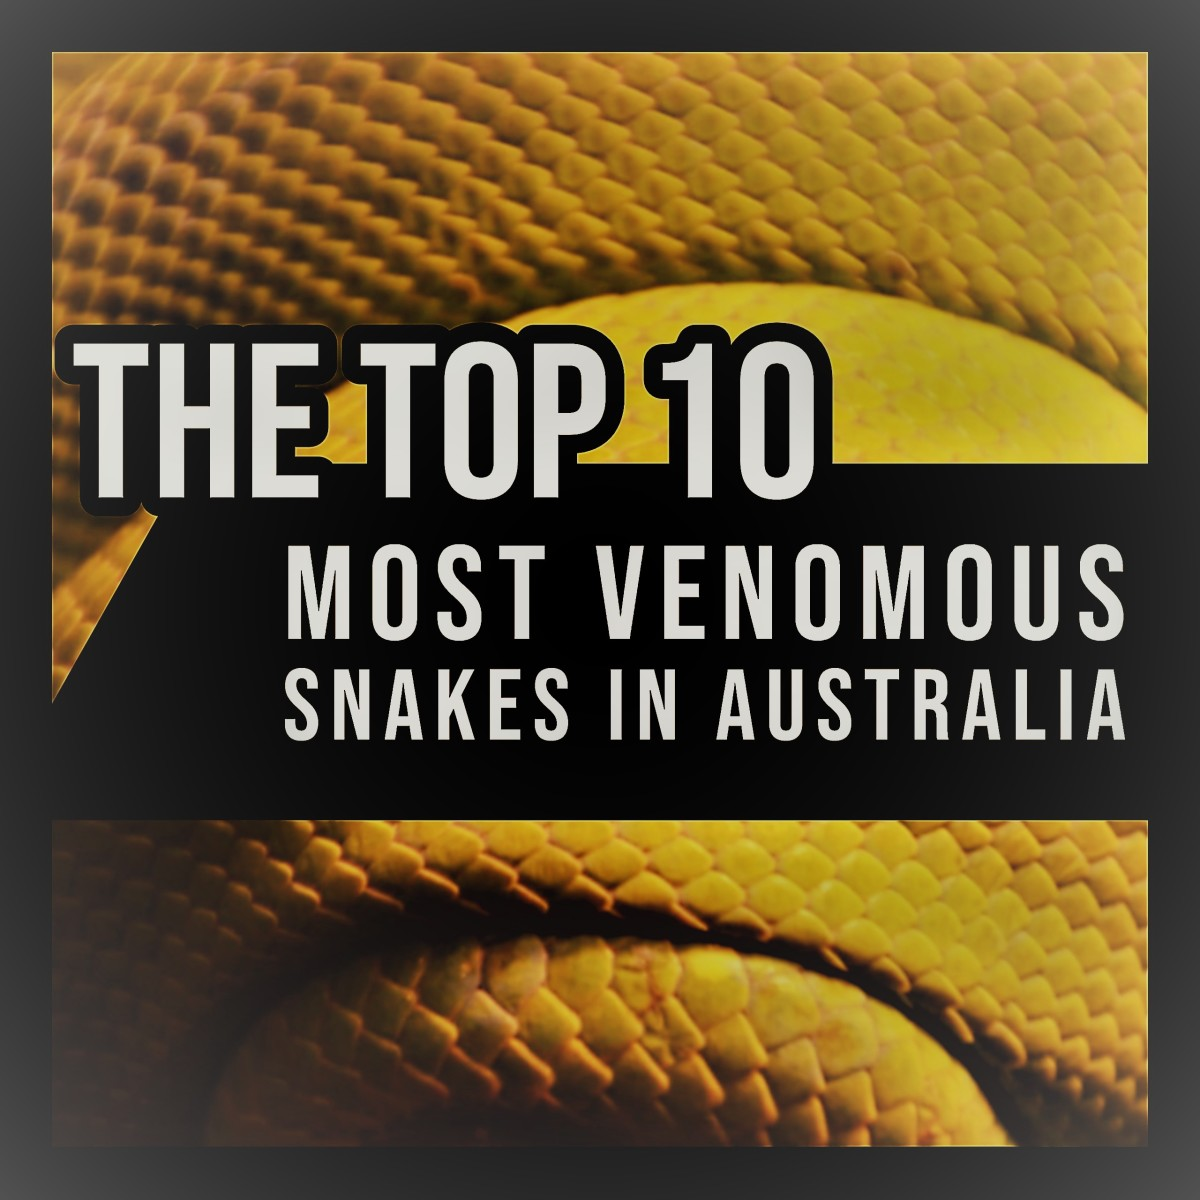 The Top 10 Most Venomous Snakes in Australia